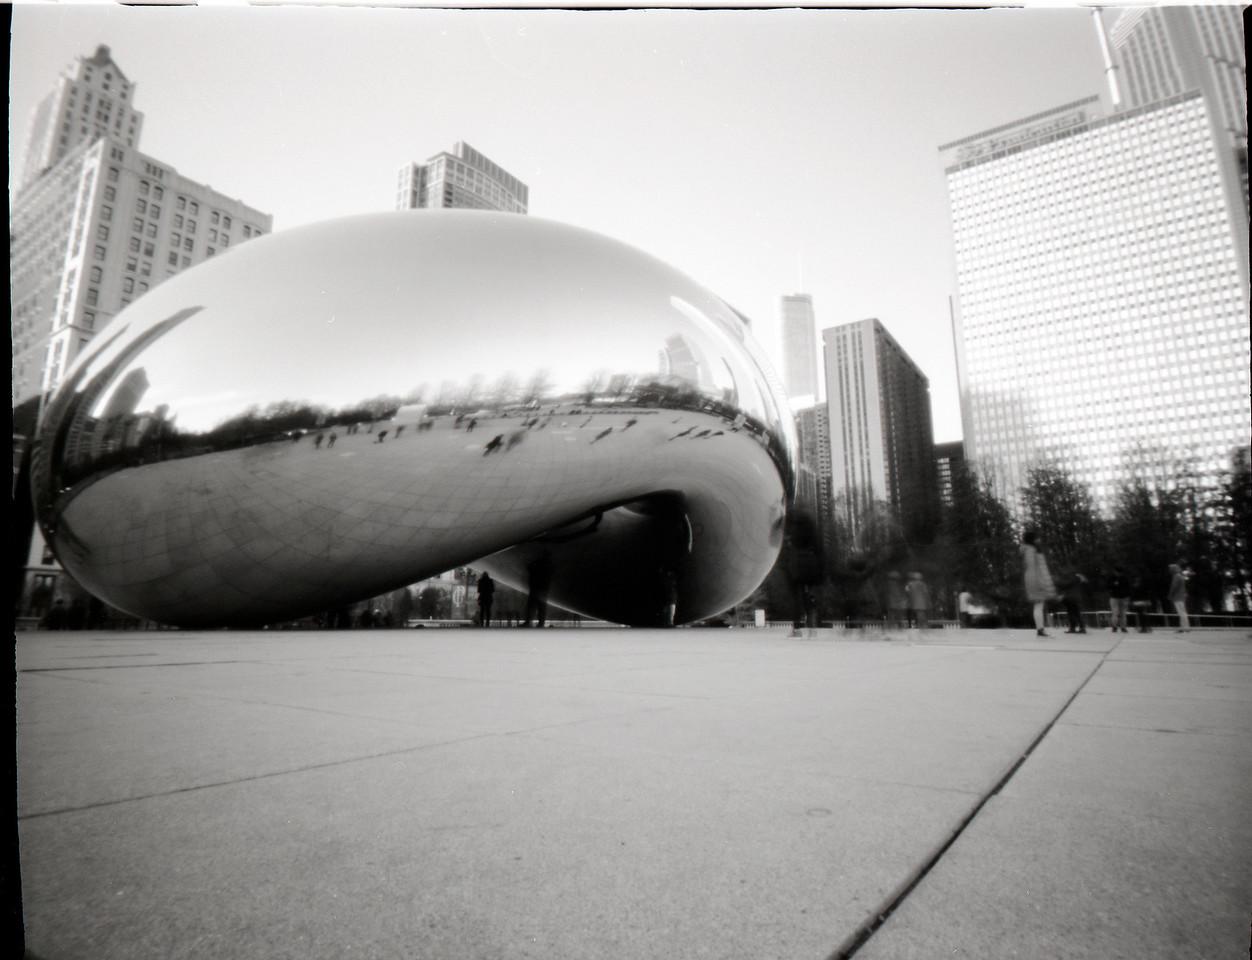 Cloud Gate (The Bean), Chicago, pinhole photograph